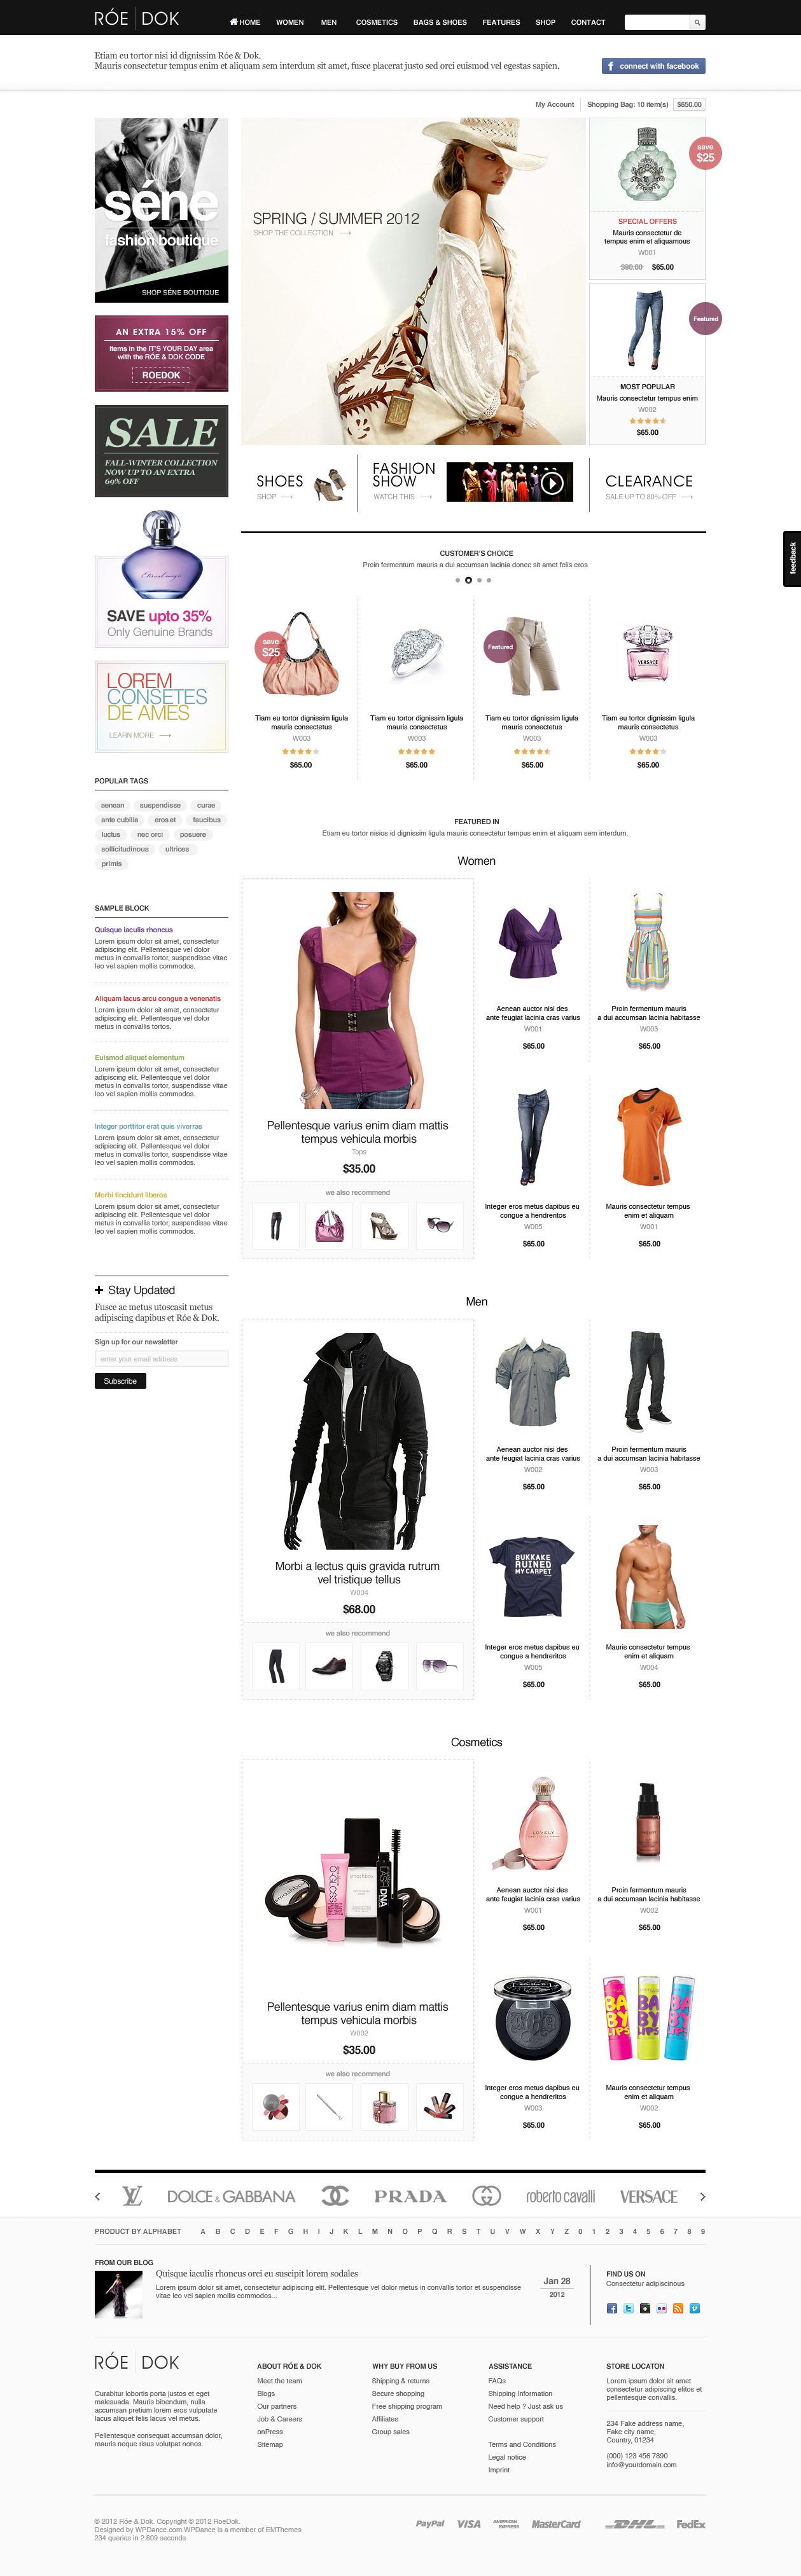 Woocommerce Wordpress Theme Roedok By Tvlgiao Themeforest